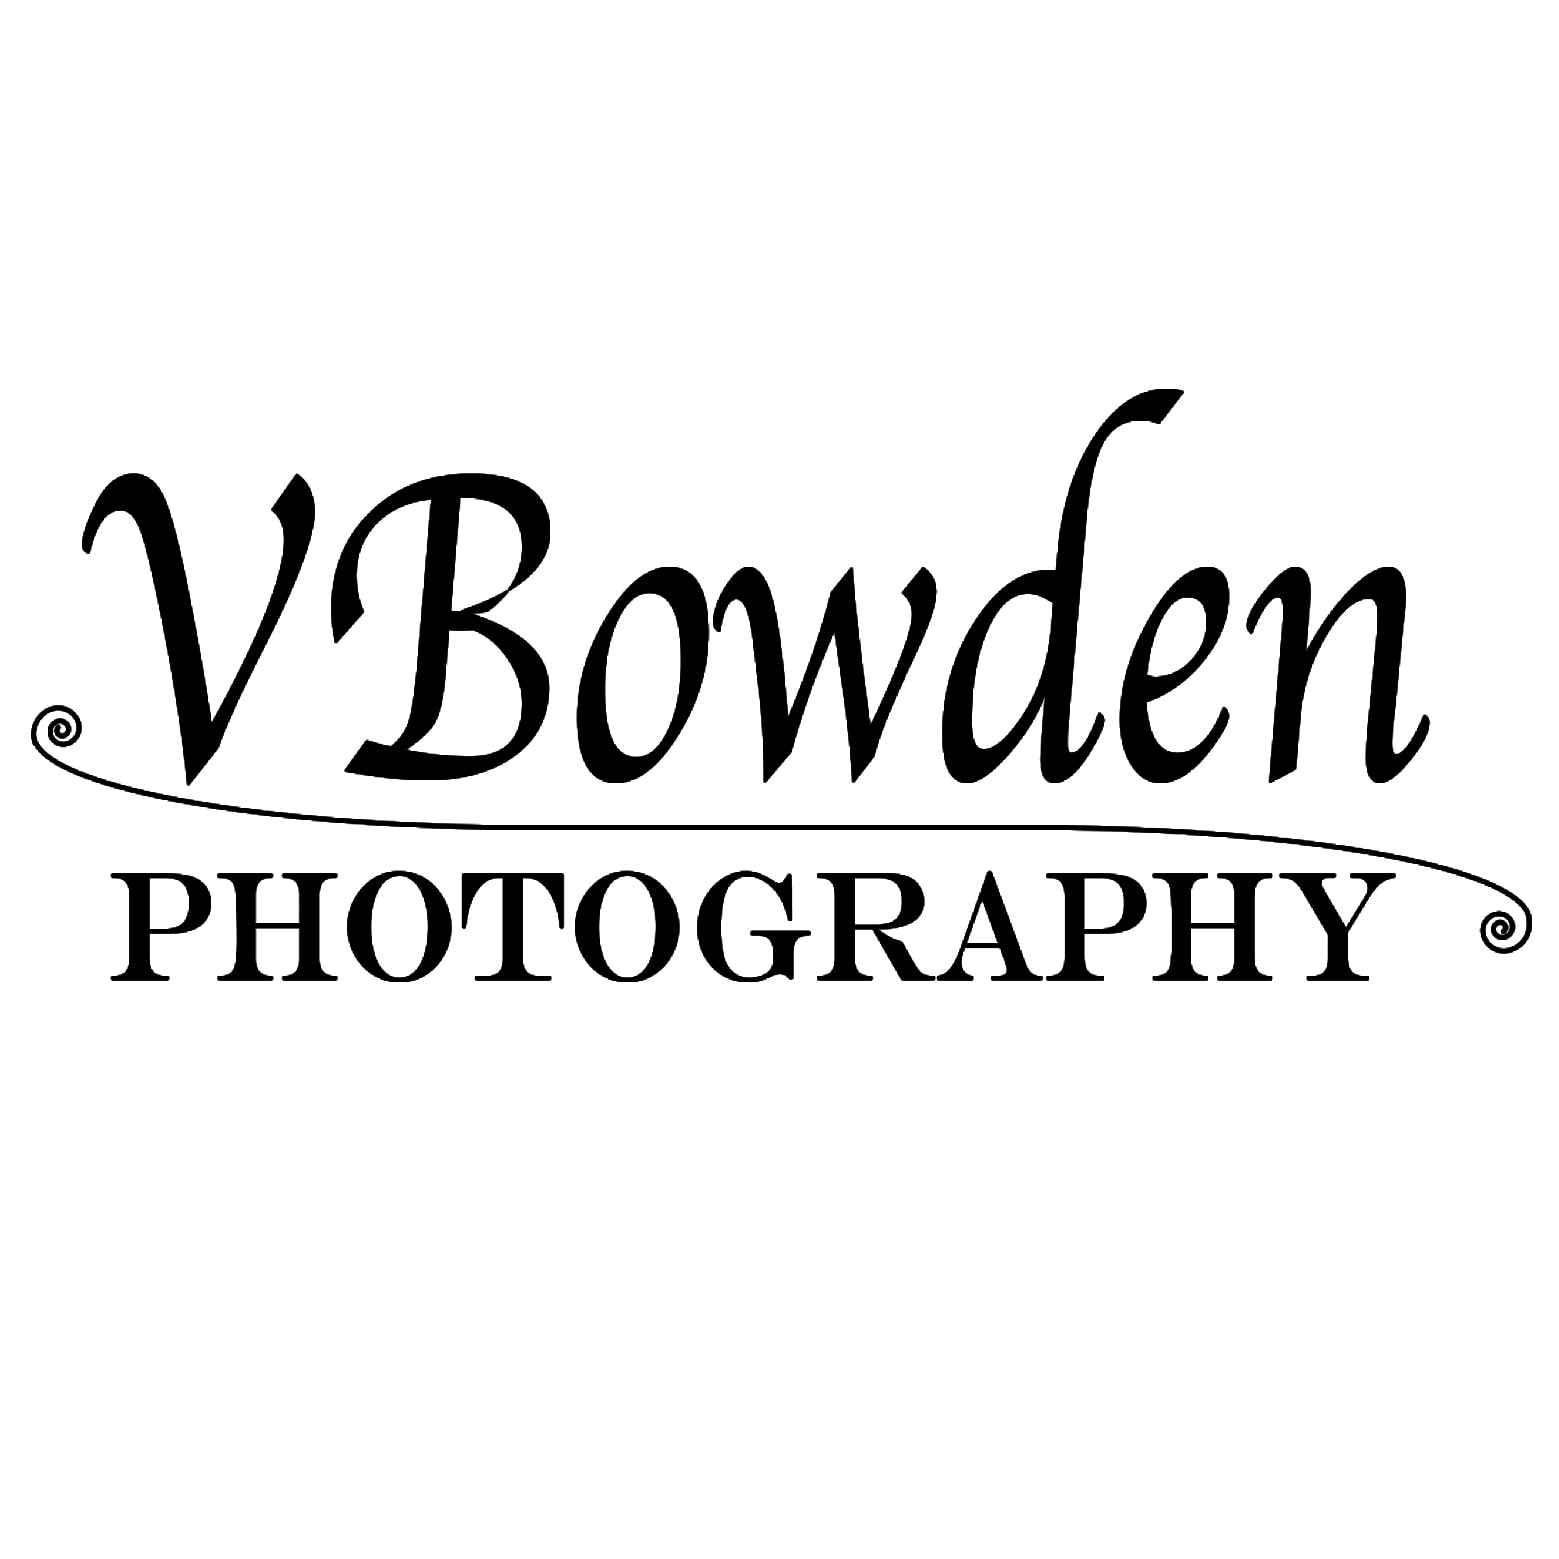 V Bowden Photography